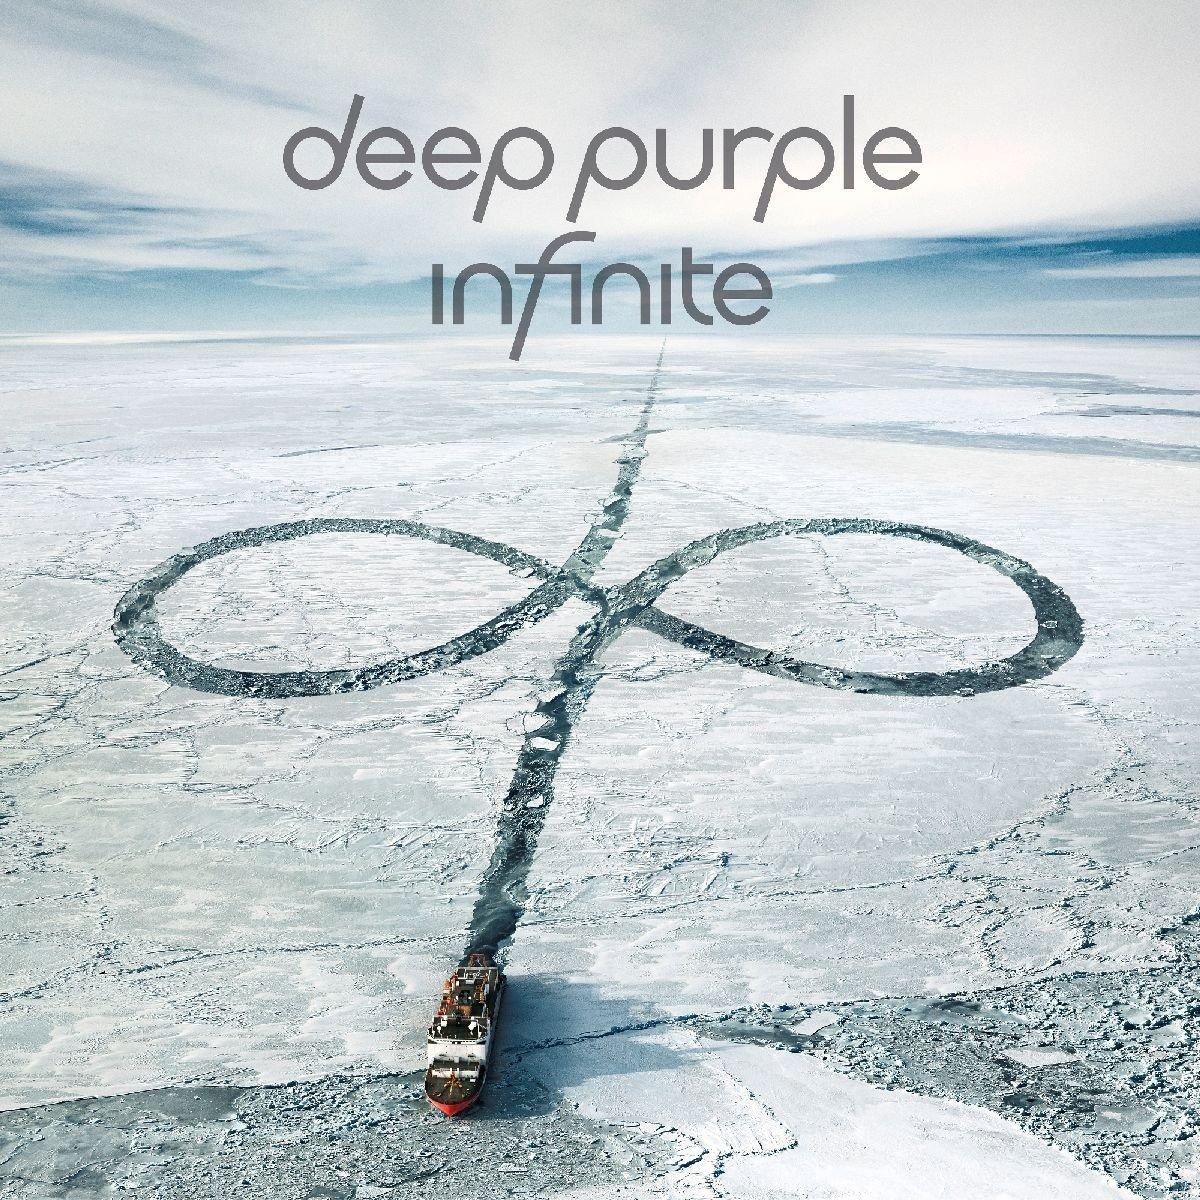 Deep Purple's 'inFinite' reaches #1 in the German Album Chart & #6 in the UK